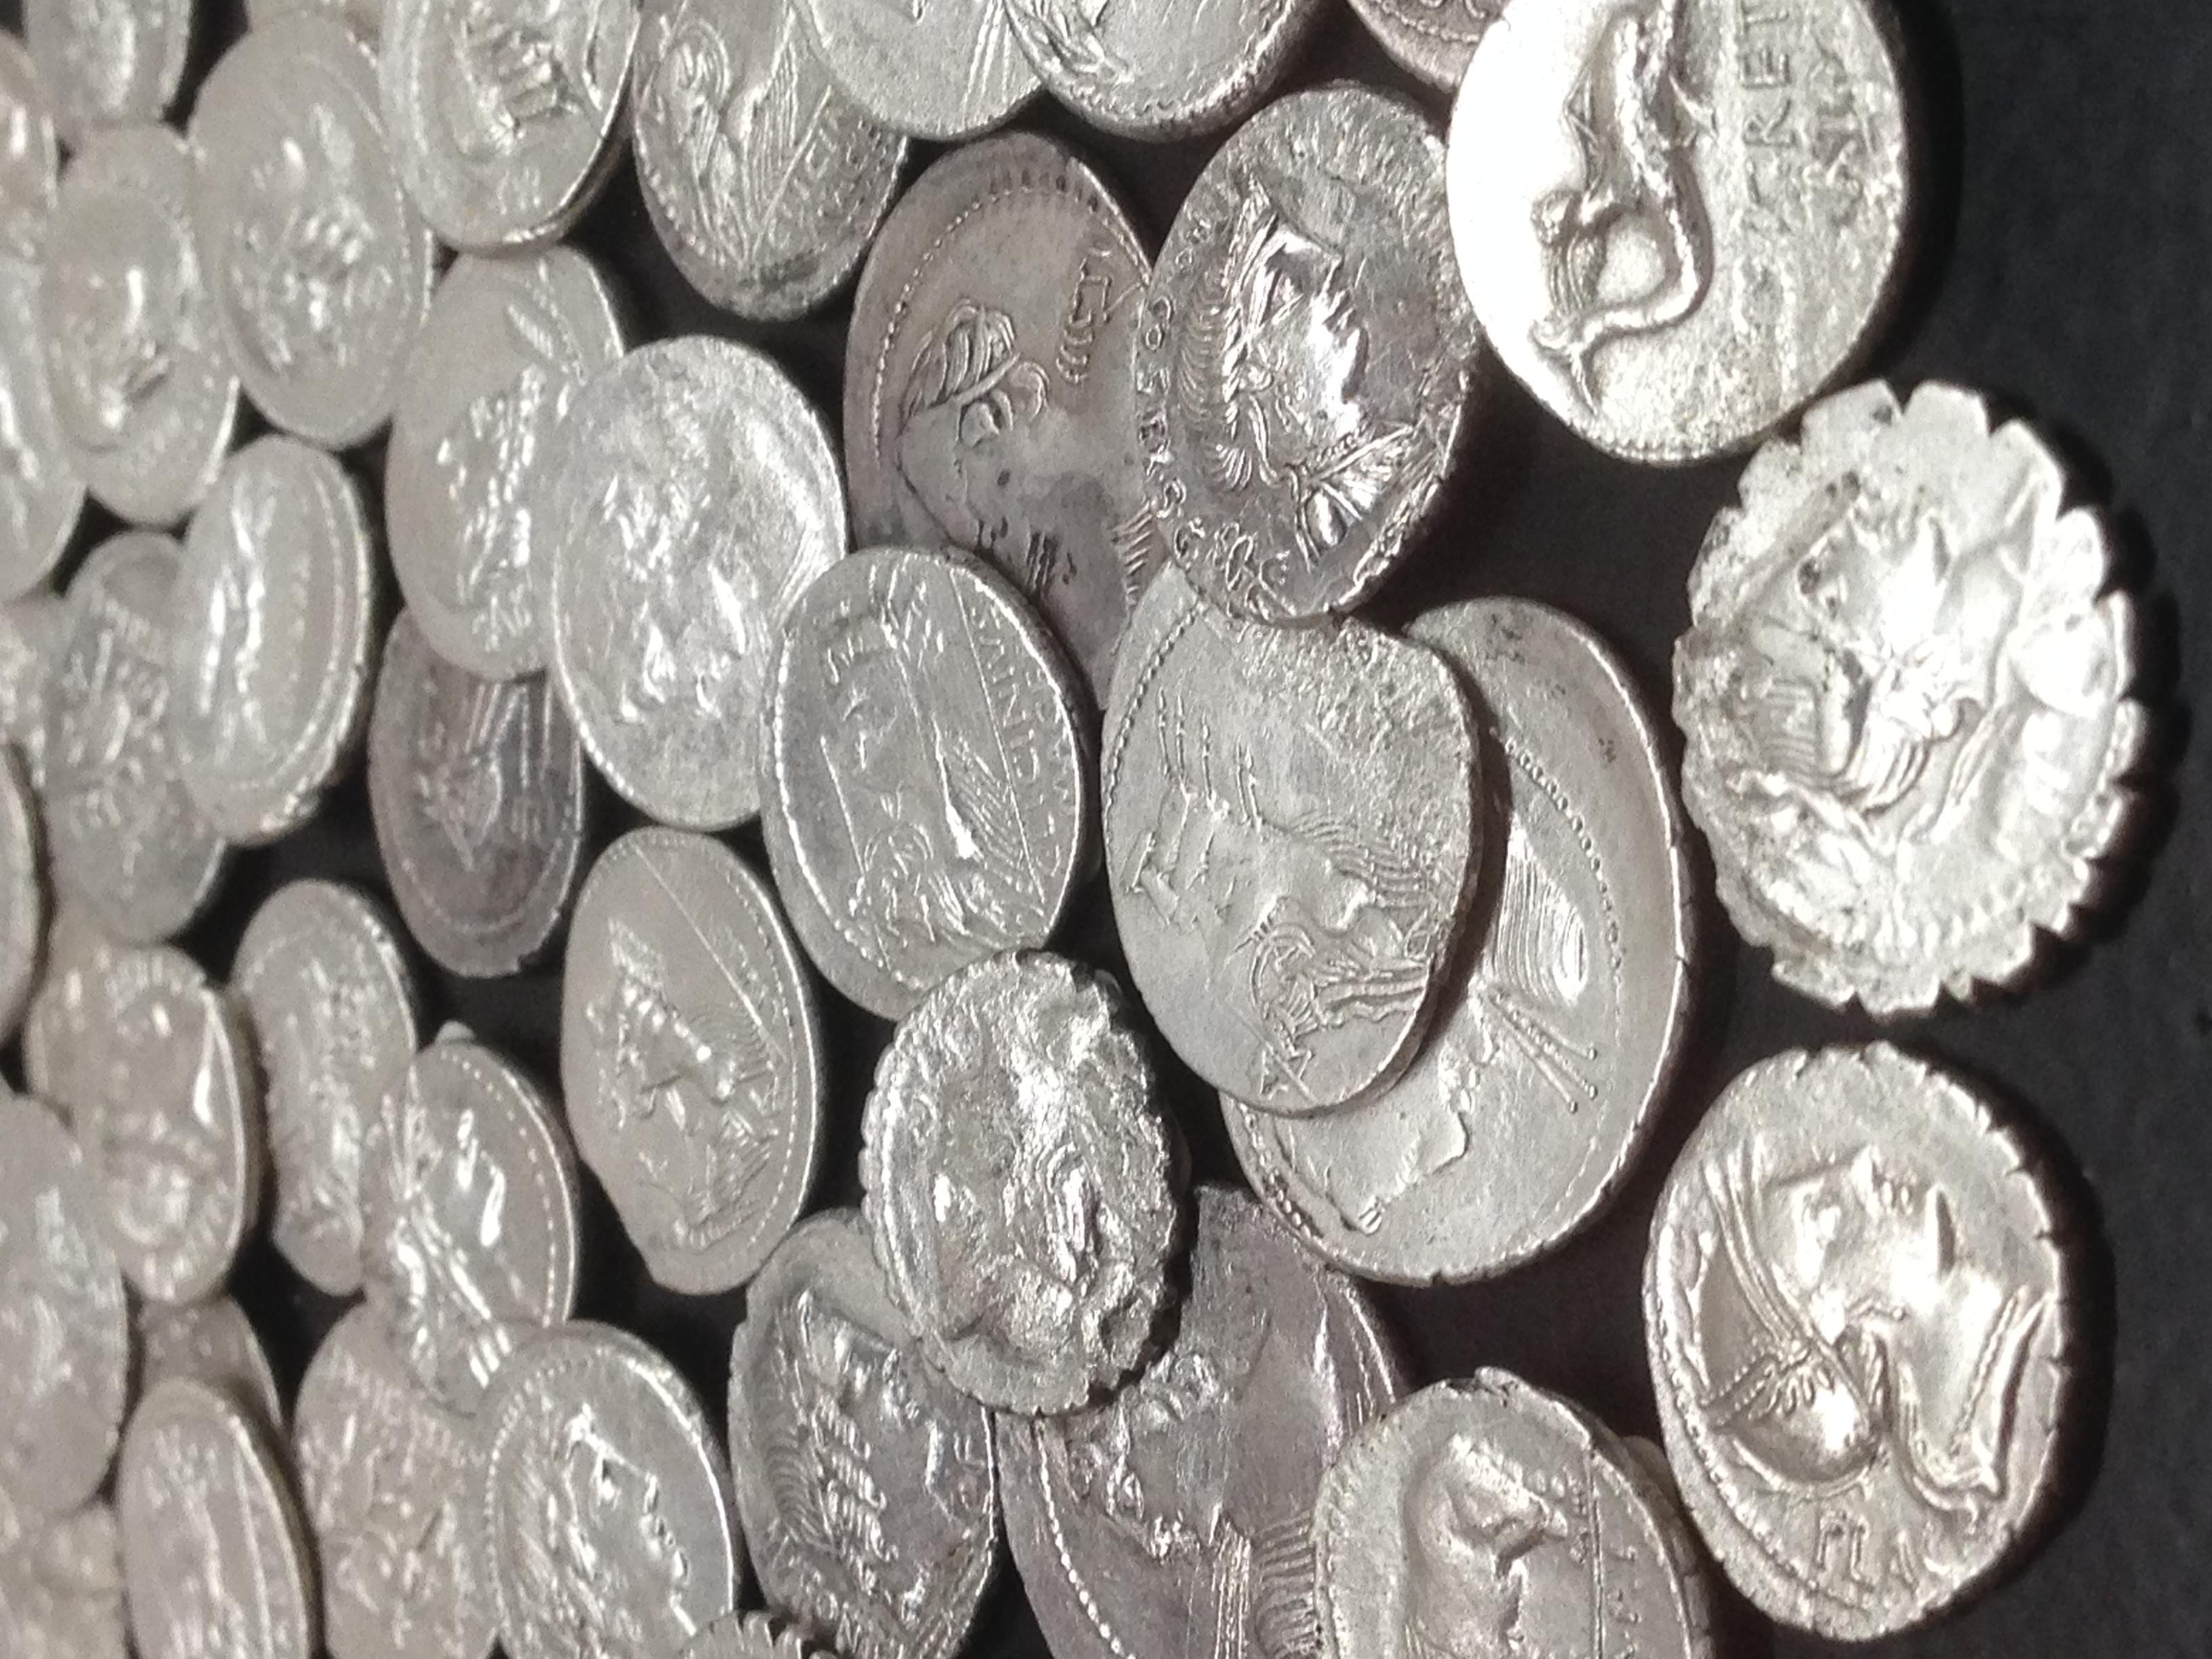 был валюта испании фото телеграфа